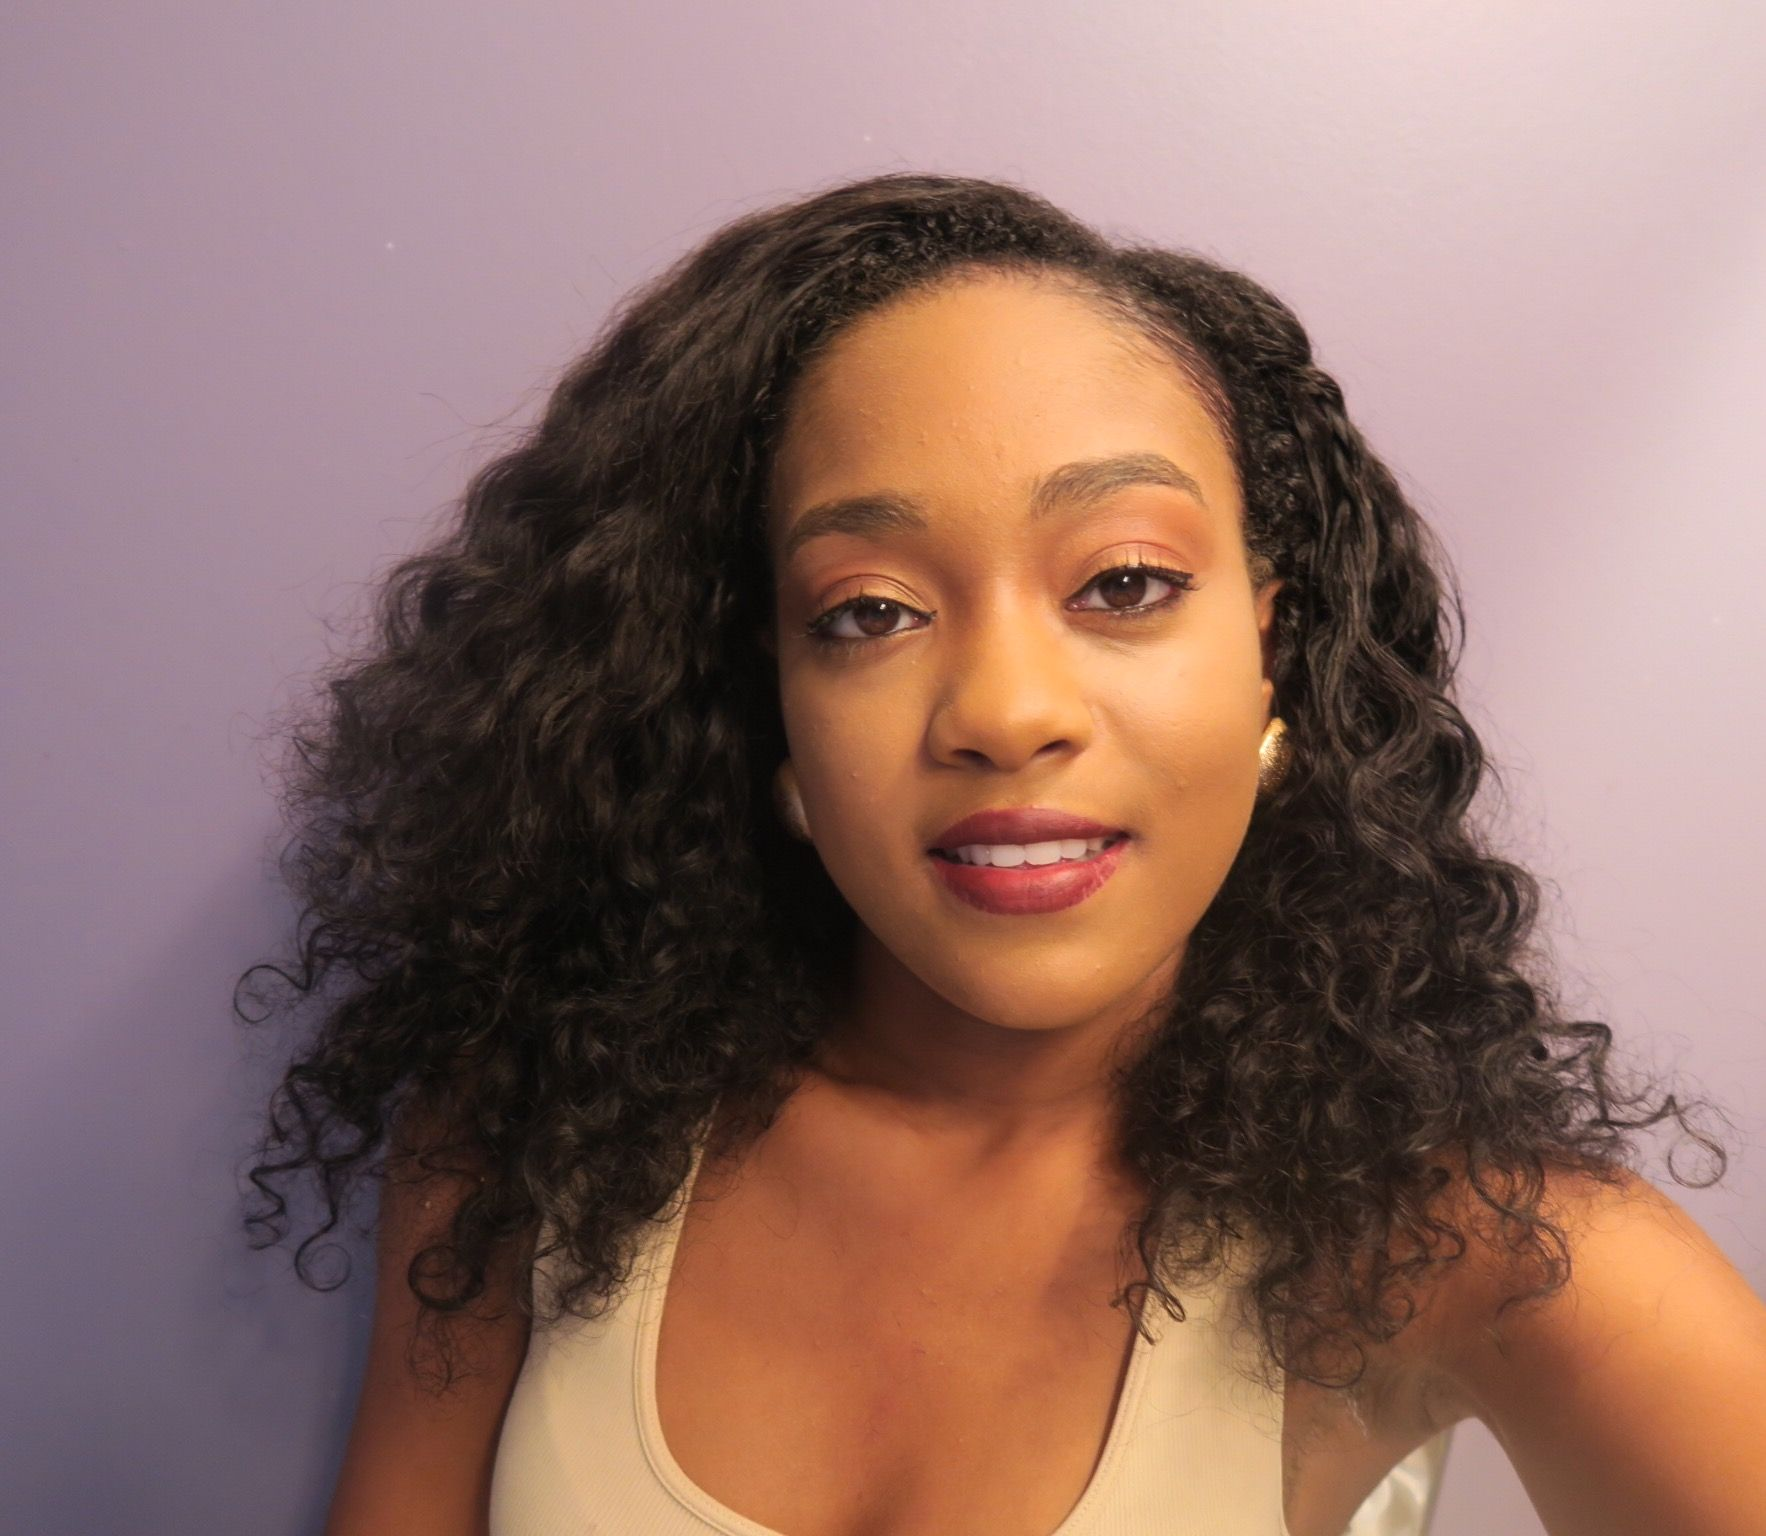 Brazilian curly beat face hair styles pinterest hair style